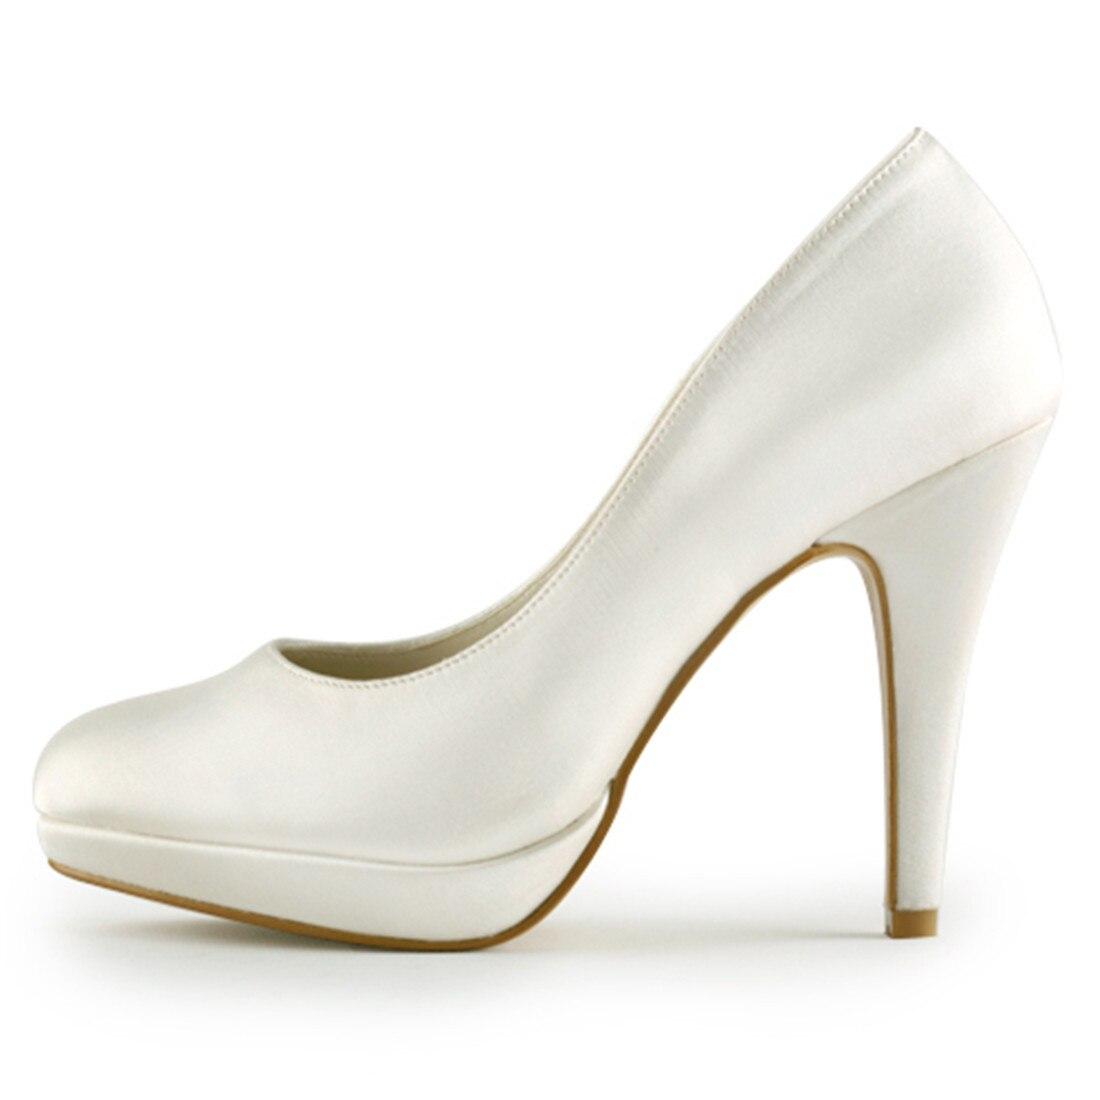 Elegantes tacones altos para novia dama de honor marfil blanco champán zapatos de plataforma de satén de lujo zapatos de boda Uninnova 521 1 LY - 2